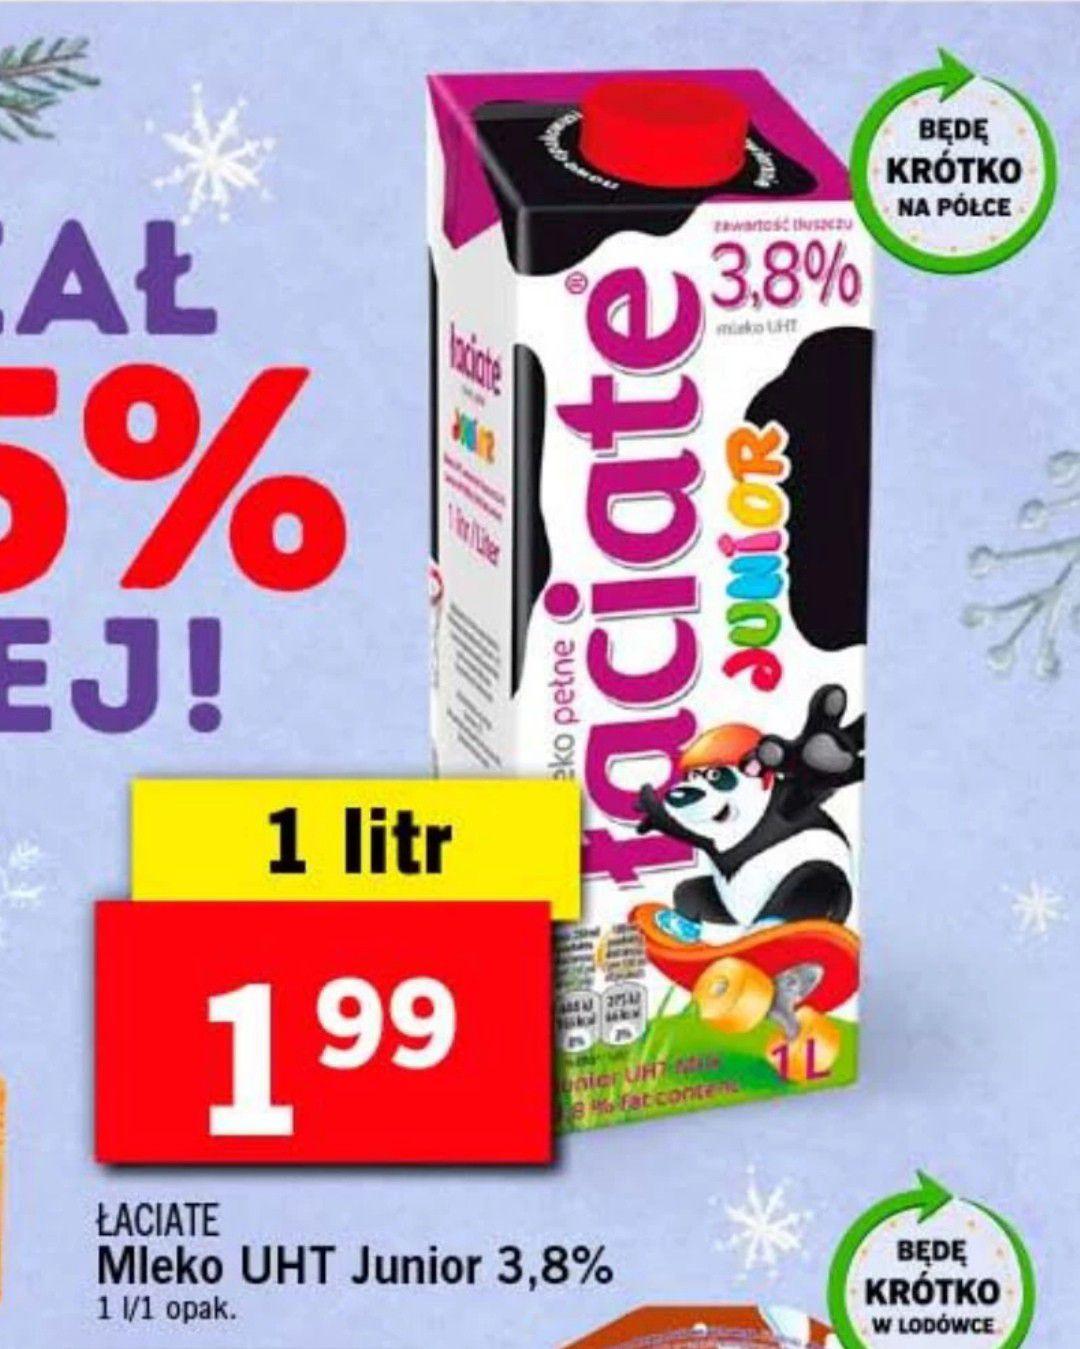 Mleko Łaciate UHT Junior 3.8% 1litr @ Lidl